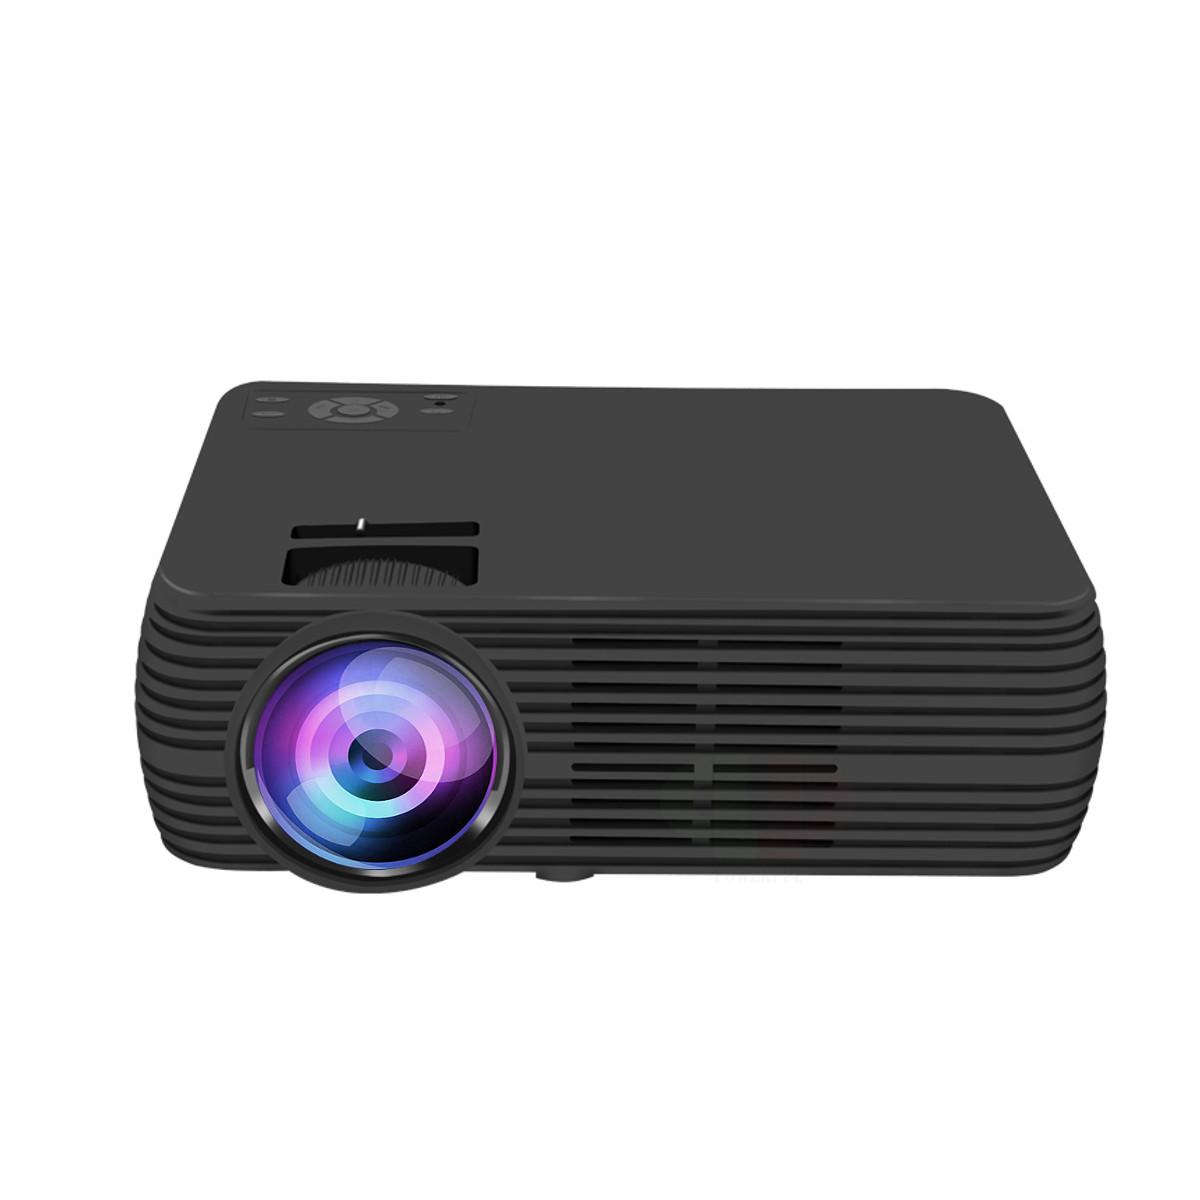 X5LCDПроекторПоддержка7000люмен 1080p HD Мультимедийный домашний кинотеатр Умный домашний кинотеатр LED Проектор HDMI VGA AV SD USB фото